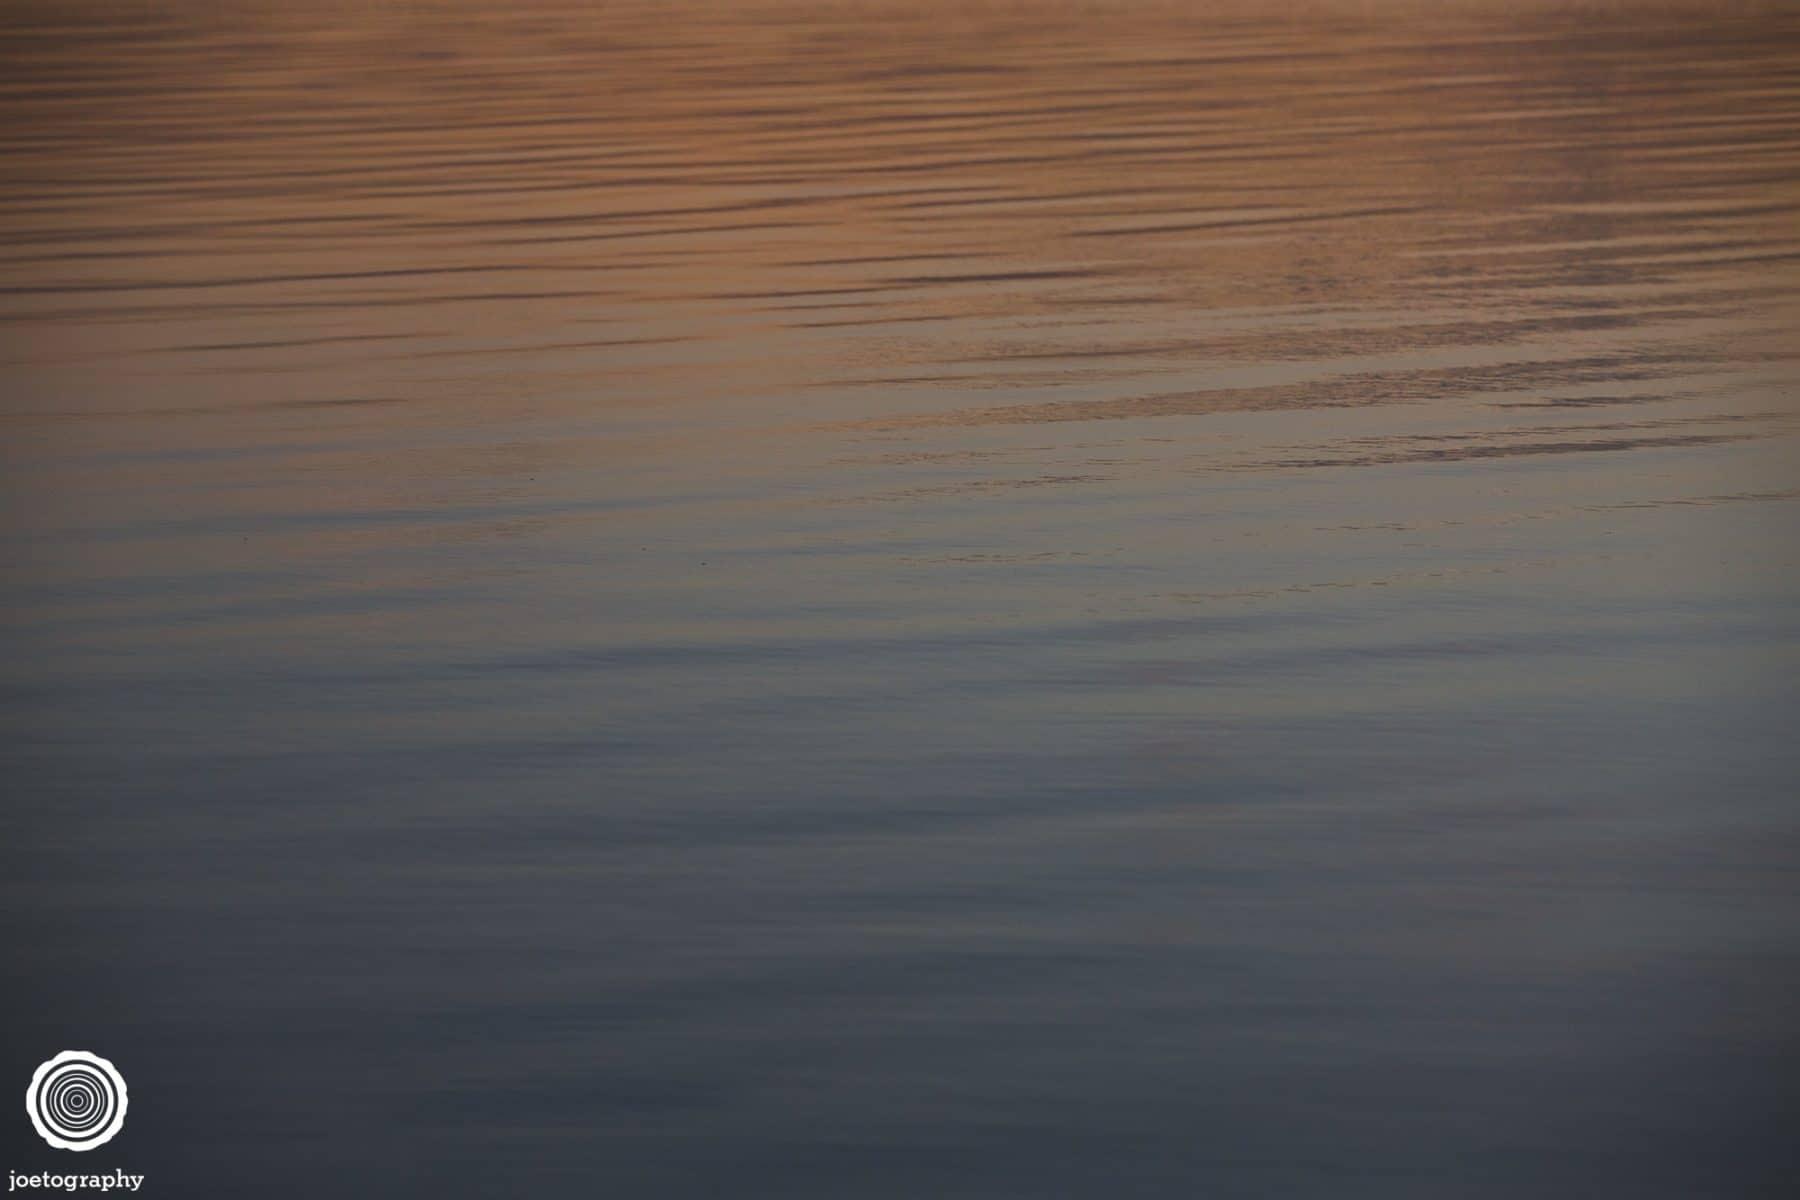 Outer-Banks-North-Carolina-Travel-Photography-4